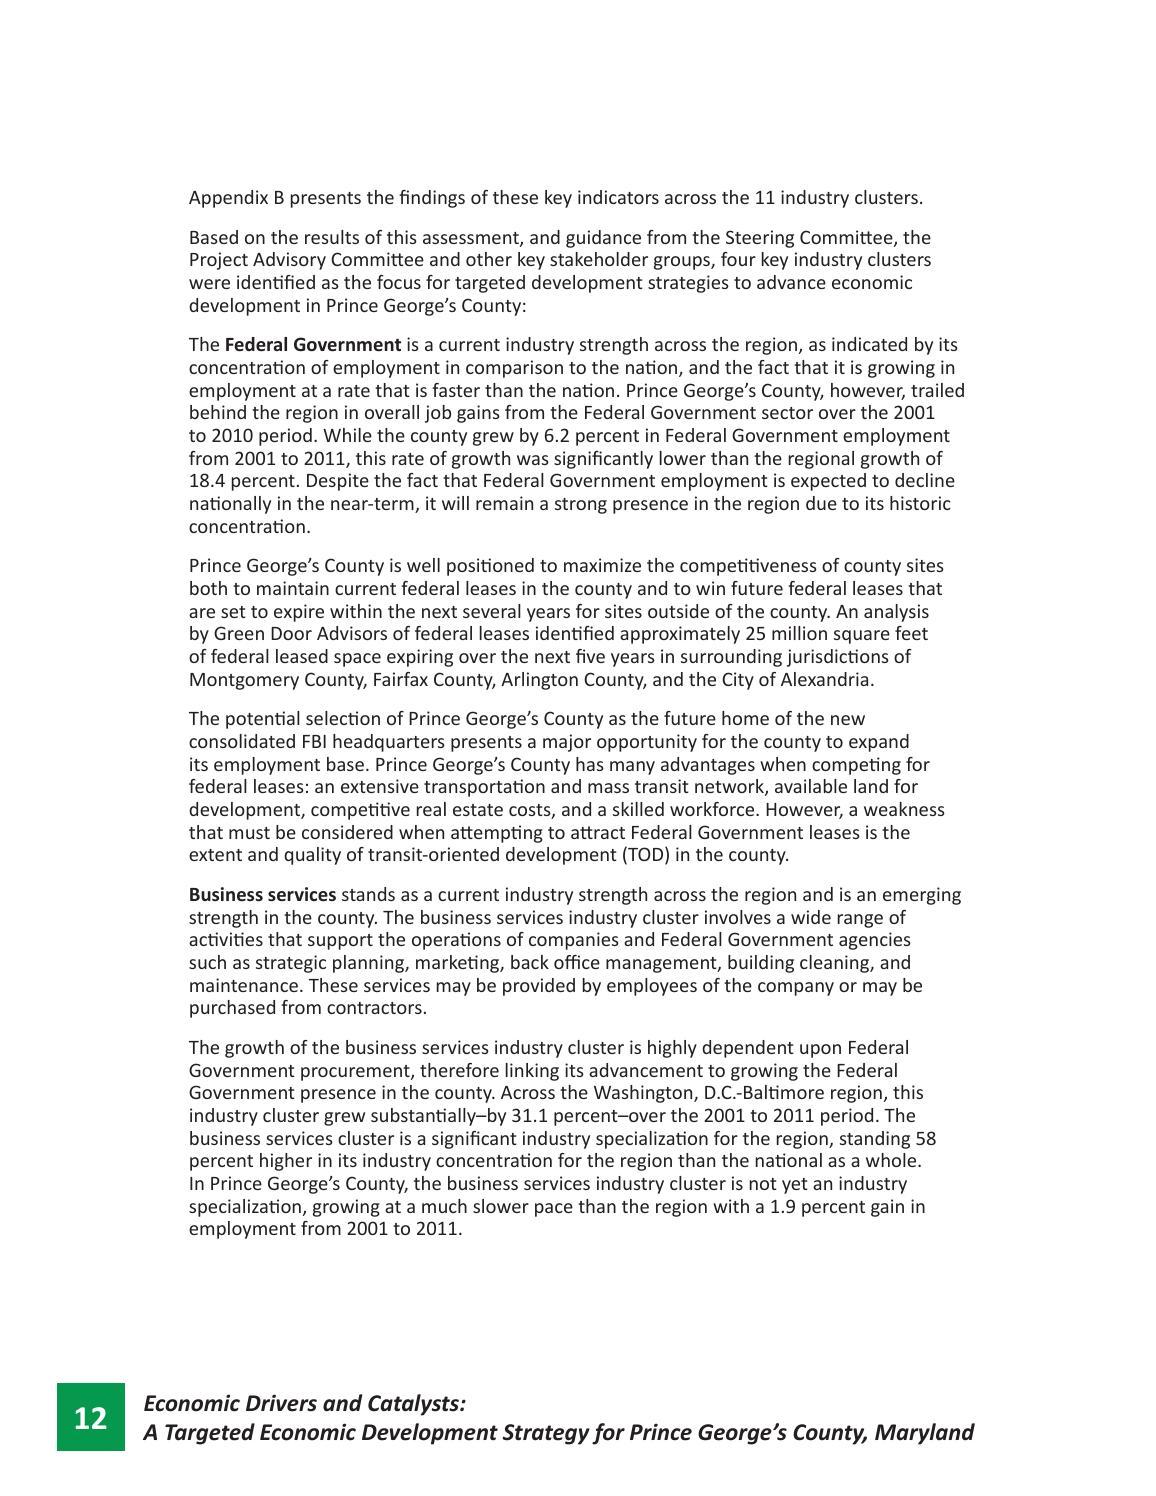 Prince George's County Economic Development Strategic Plan